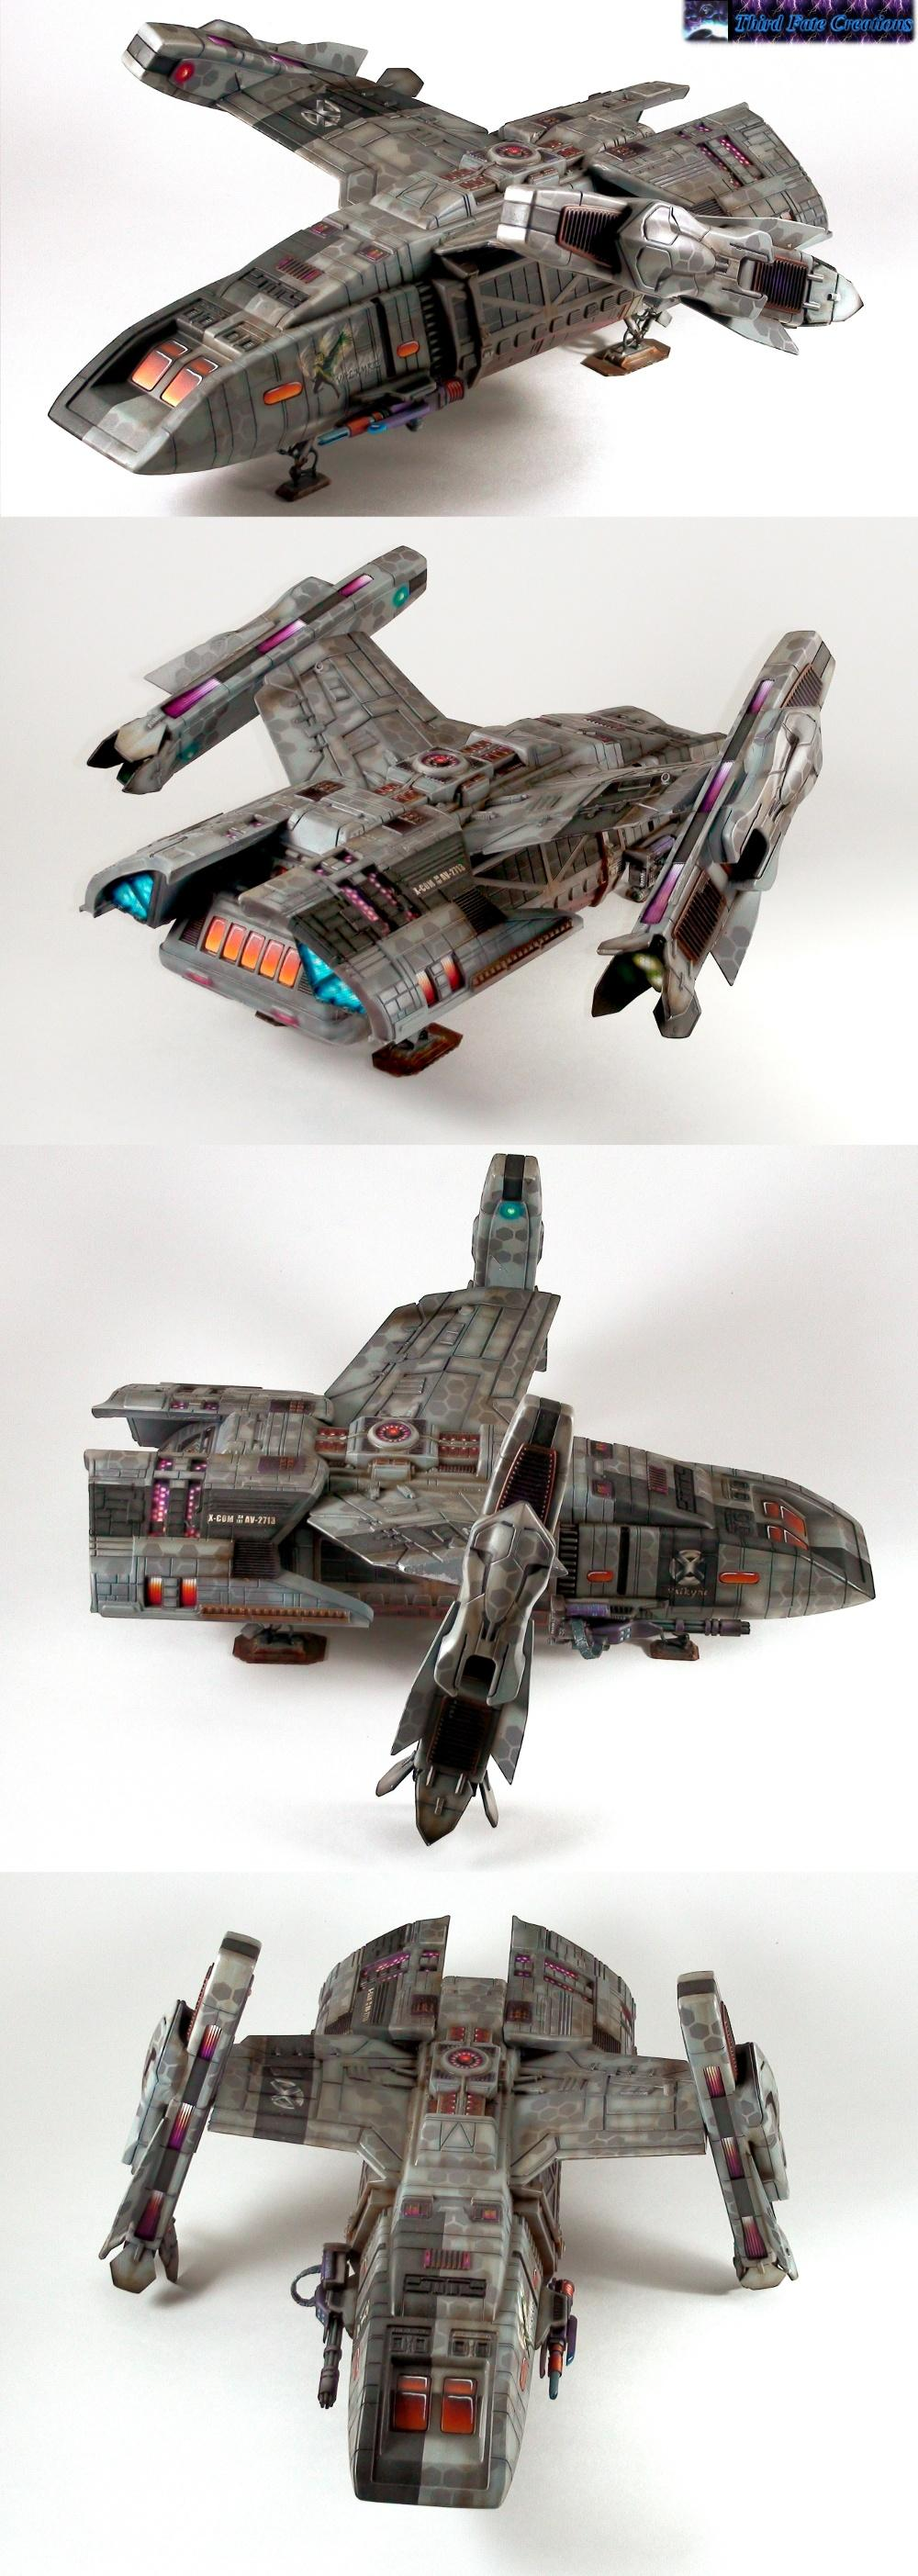 Conversion, Drop Ship, Flyer, Runabout, Shuttle, Star Trek, Vtol